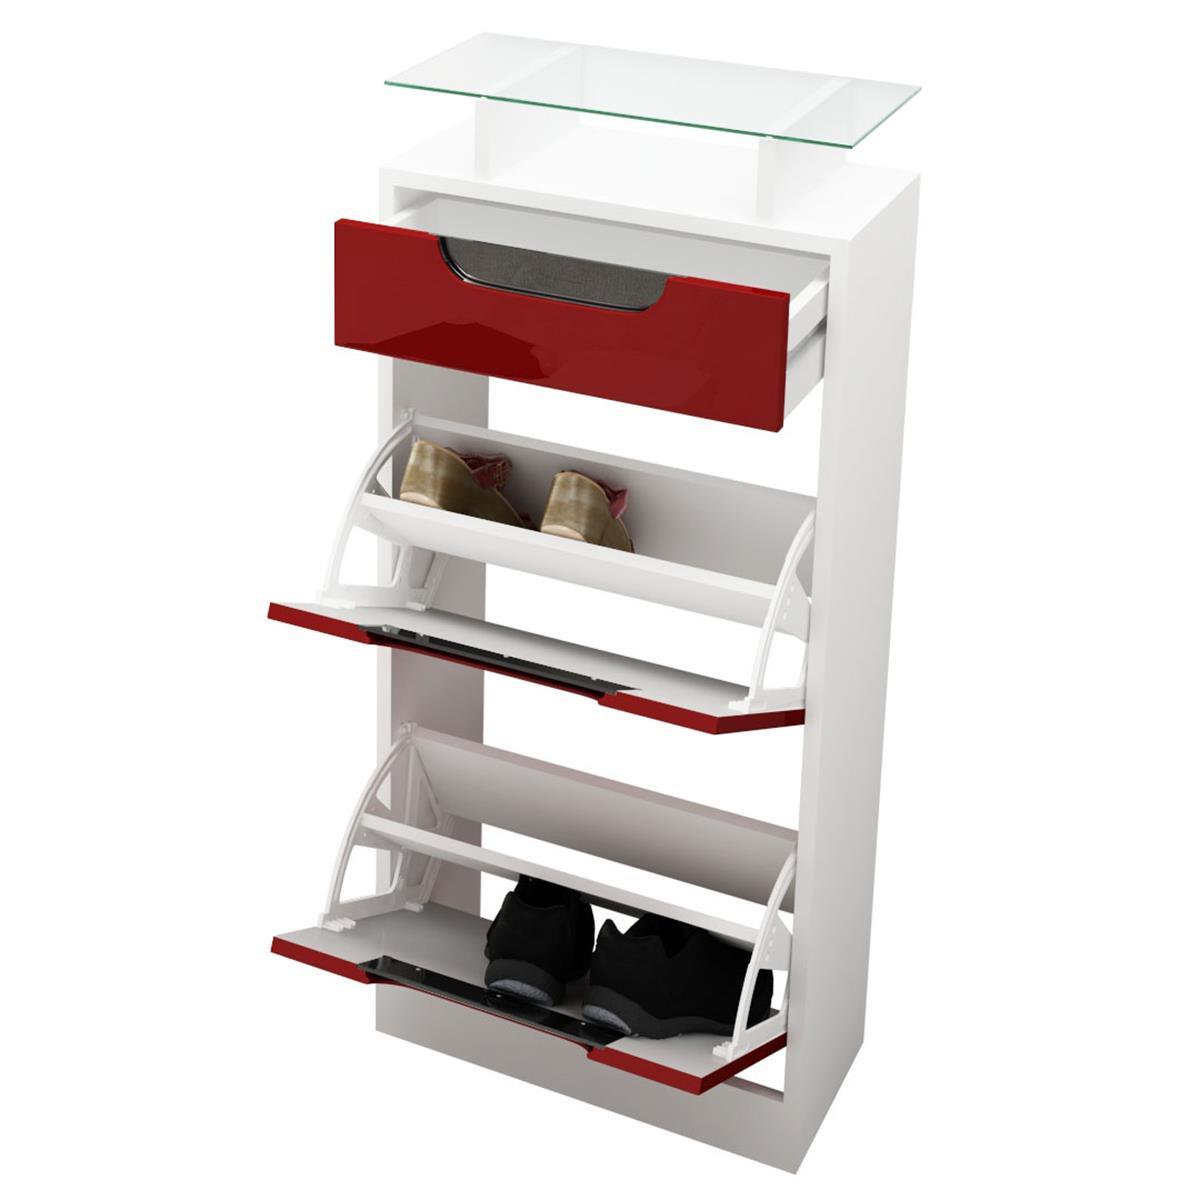 schuhkipper fiesta v2 mit farbigen absetzungen schublade. Black Bedroom Furniture Sets. Home Design Ideas